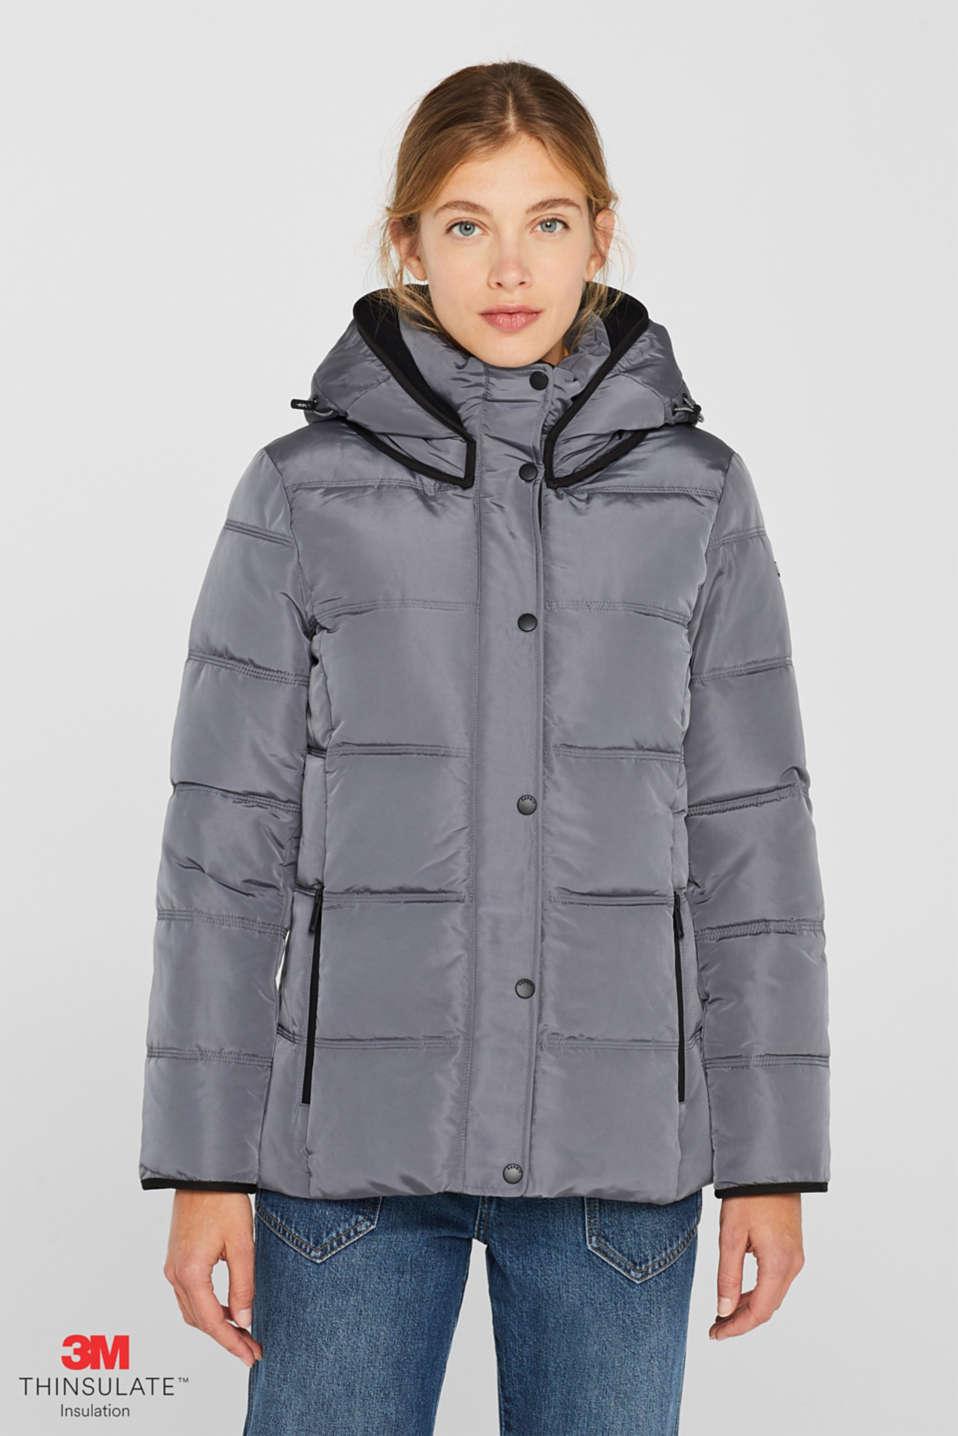 Jackets outdoor woven, DARK GREY, detail image number 0